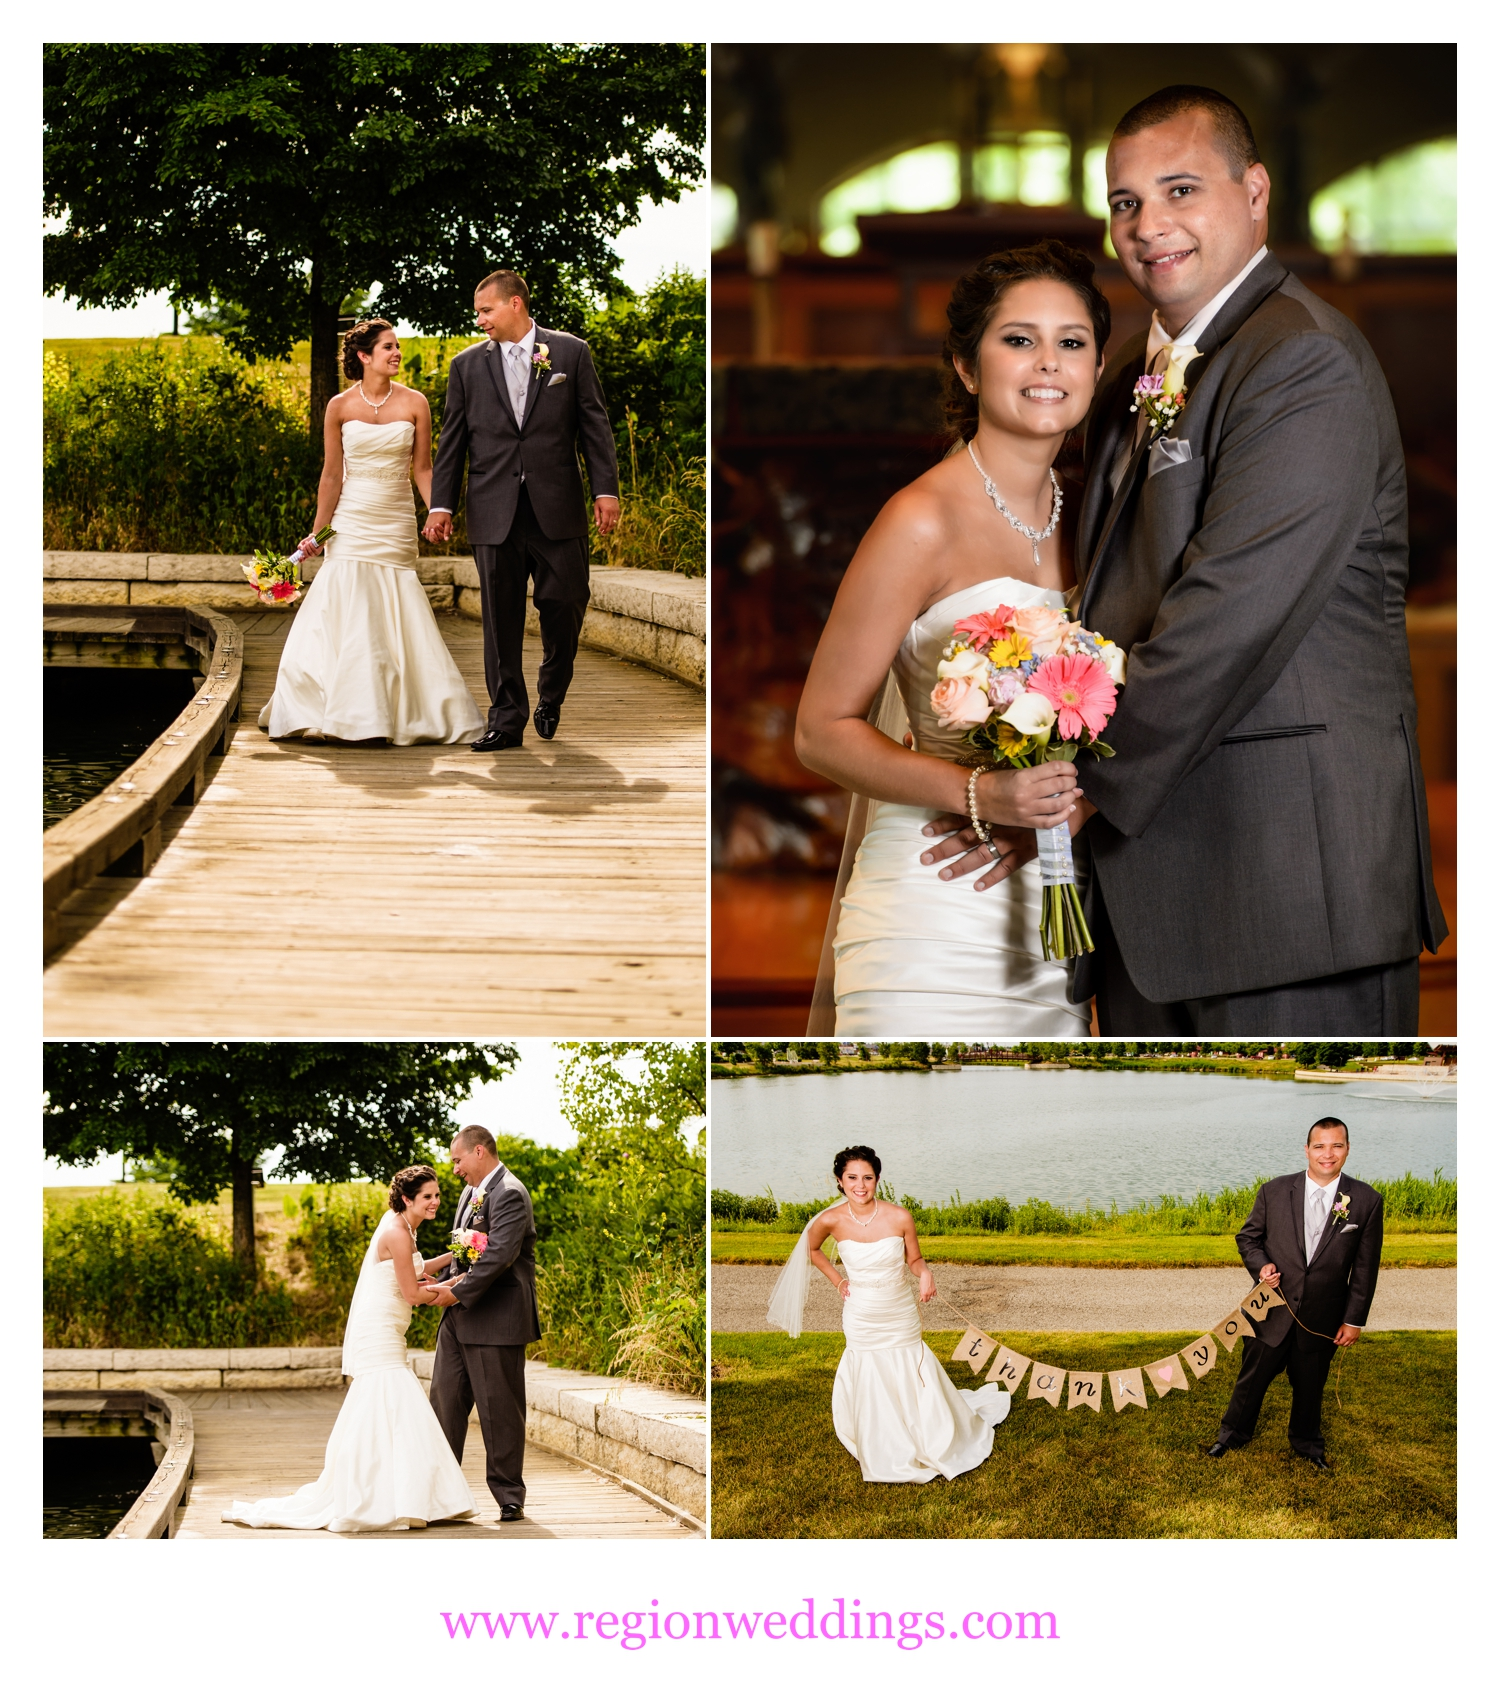 Bride and groom wedding photos at Centennial Park and St. Michael's Church.